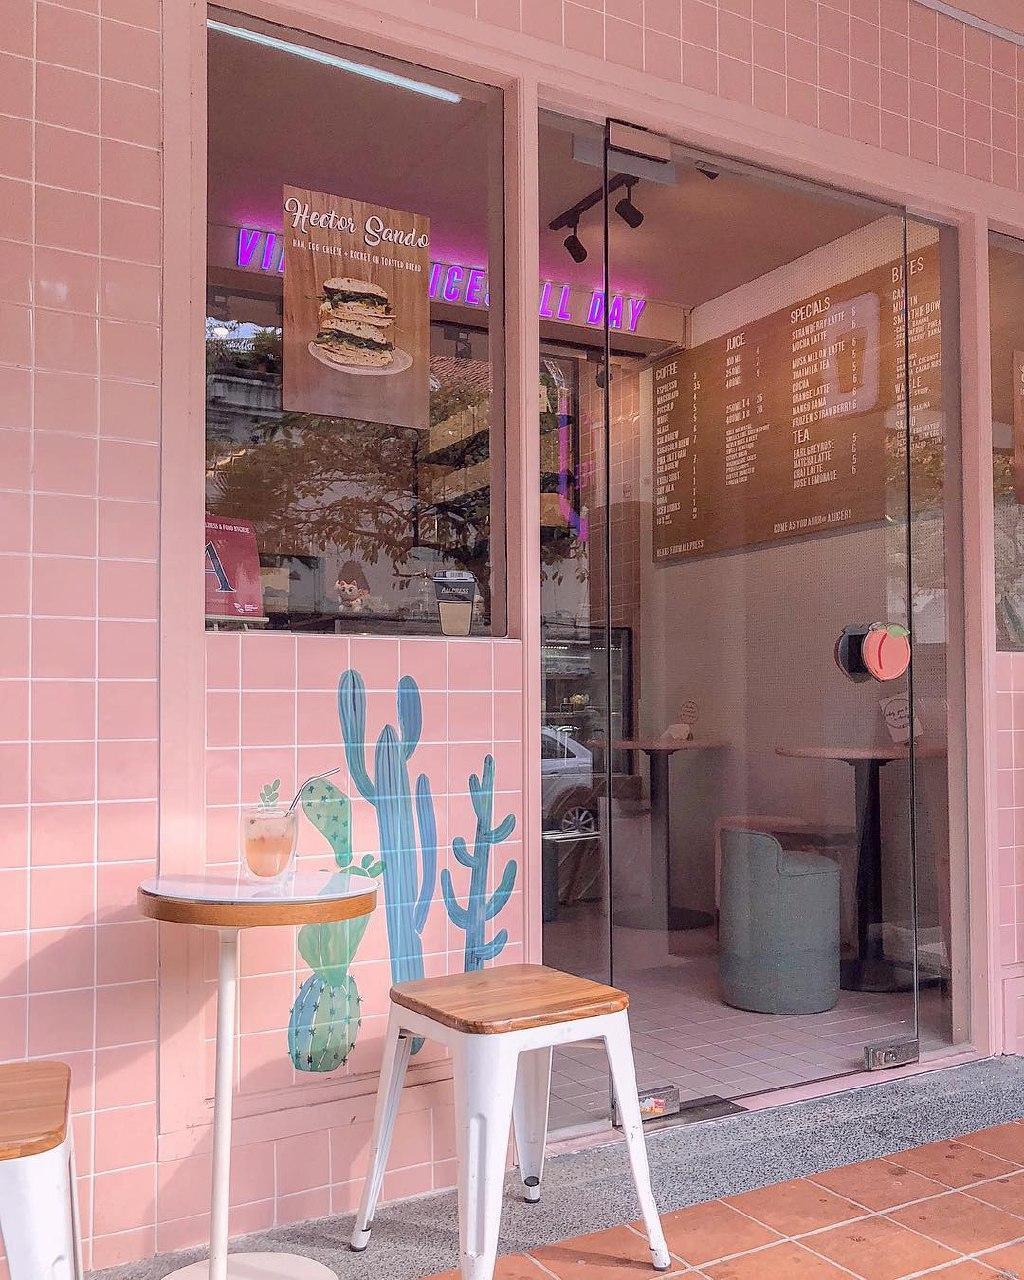 a juicery cafe exterior